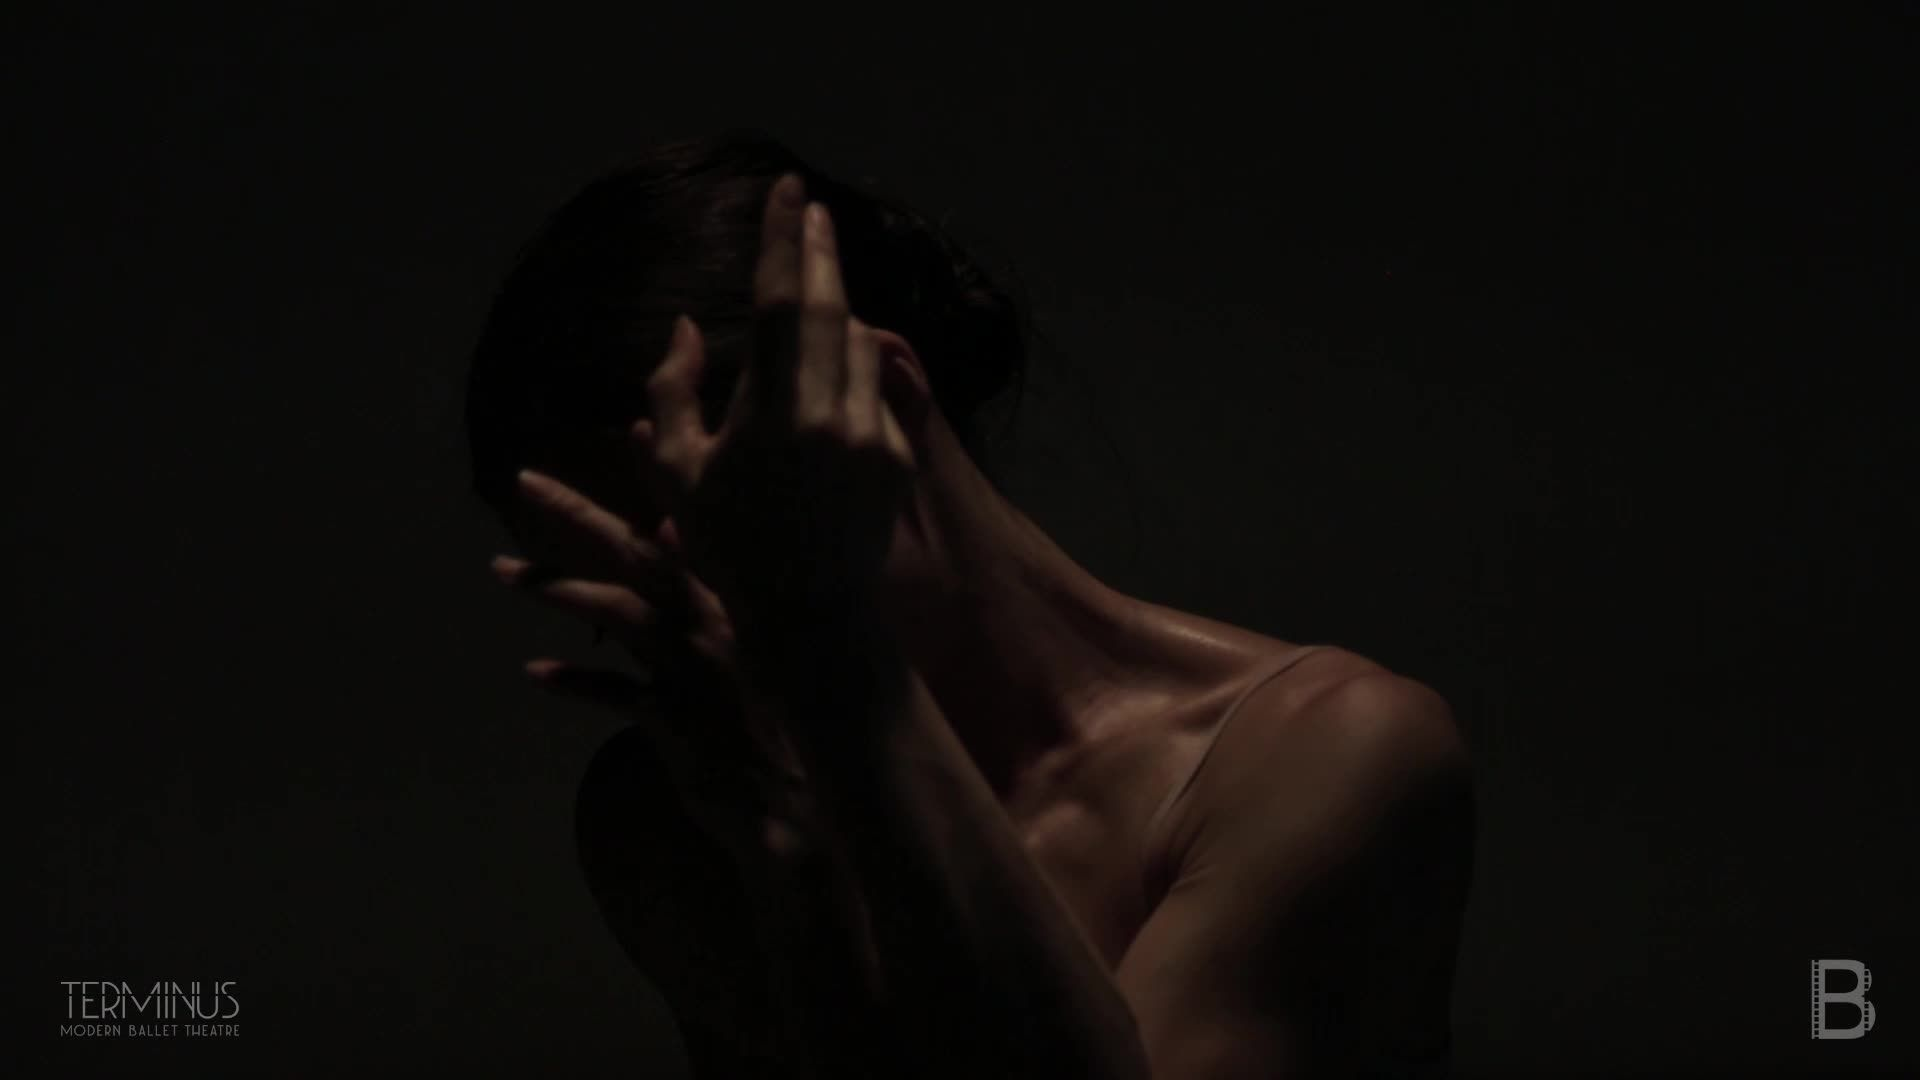 BELLA Presents: daily bello S1 Ep30 Terminus Modern Ballet Theatre 2